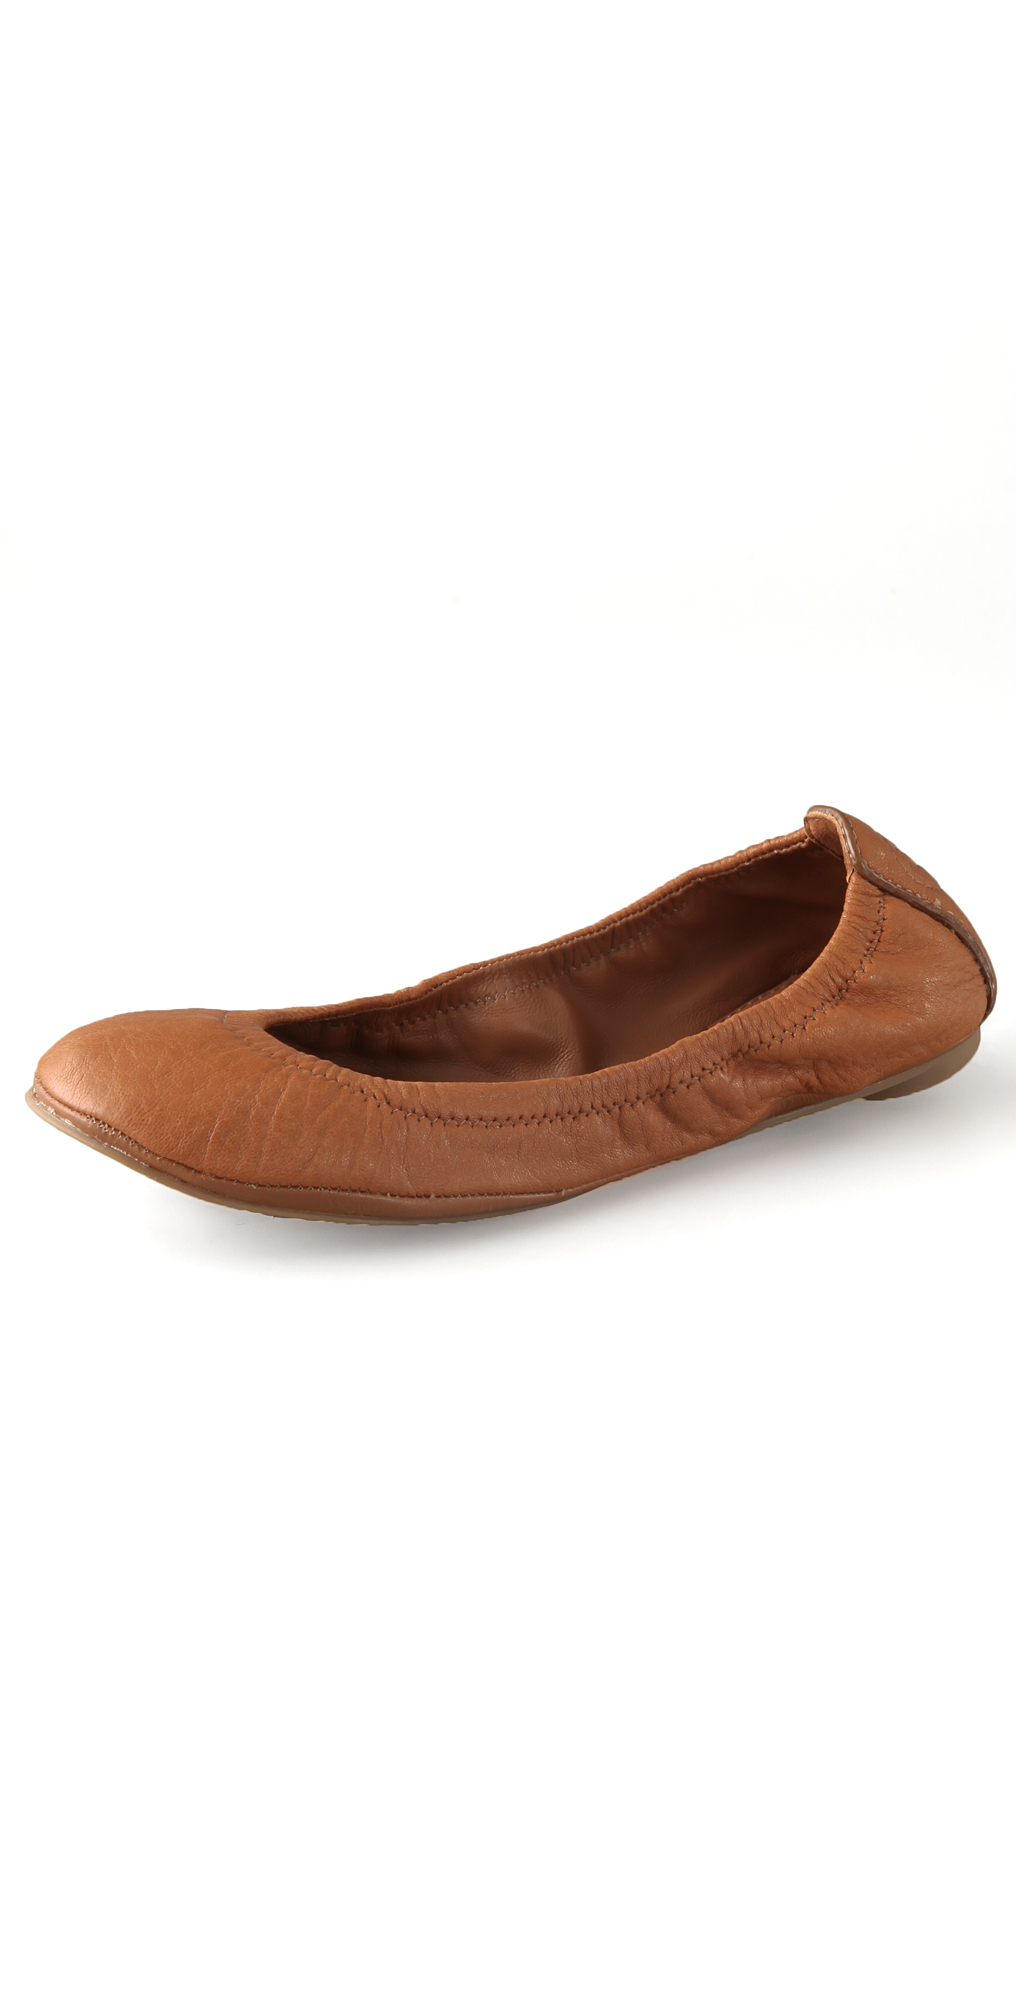 fa1ad3202e32 Tory Burch Eddie Ballet Flats